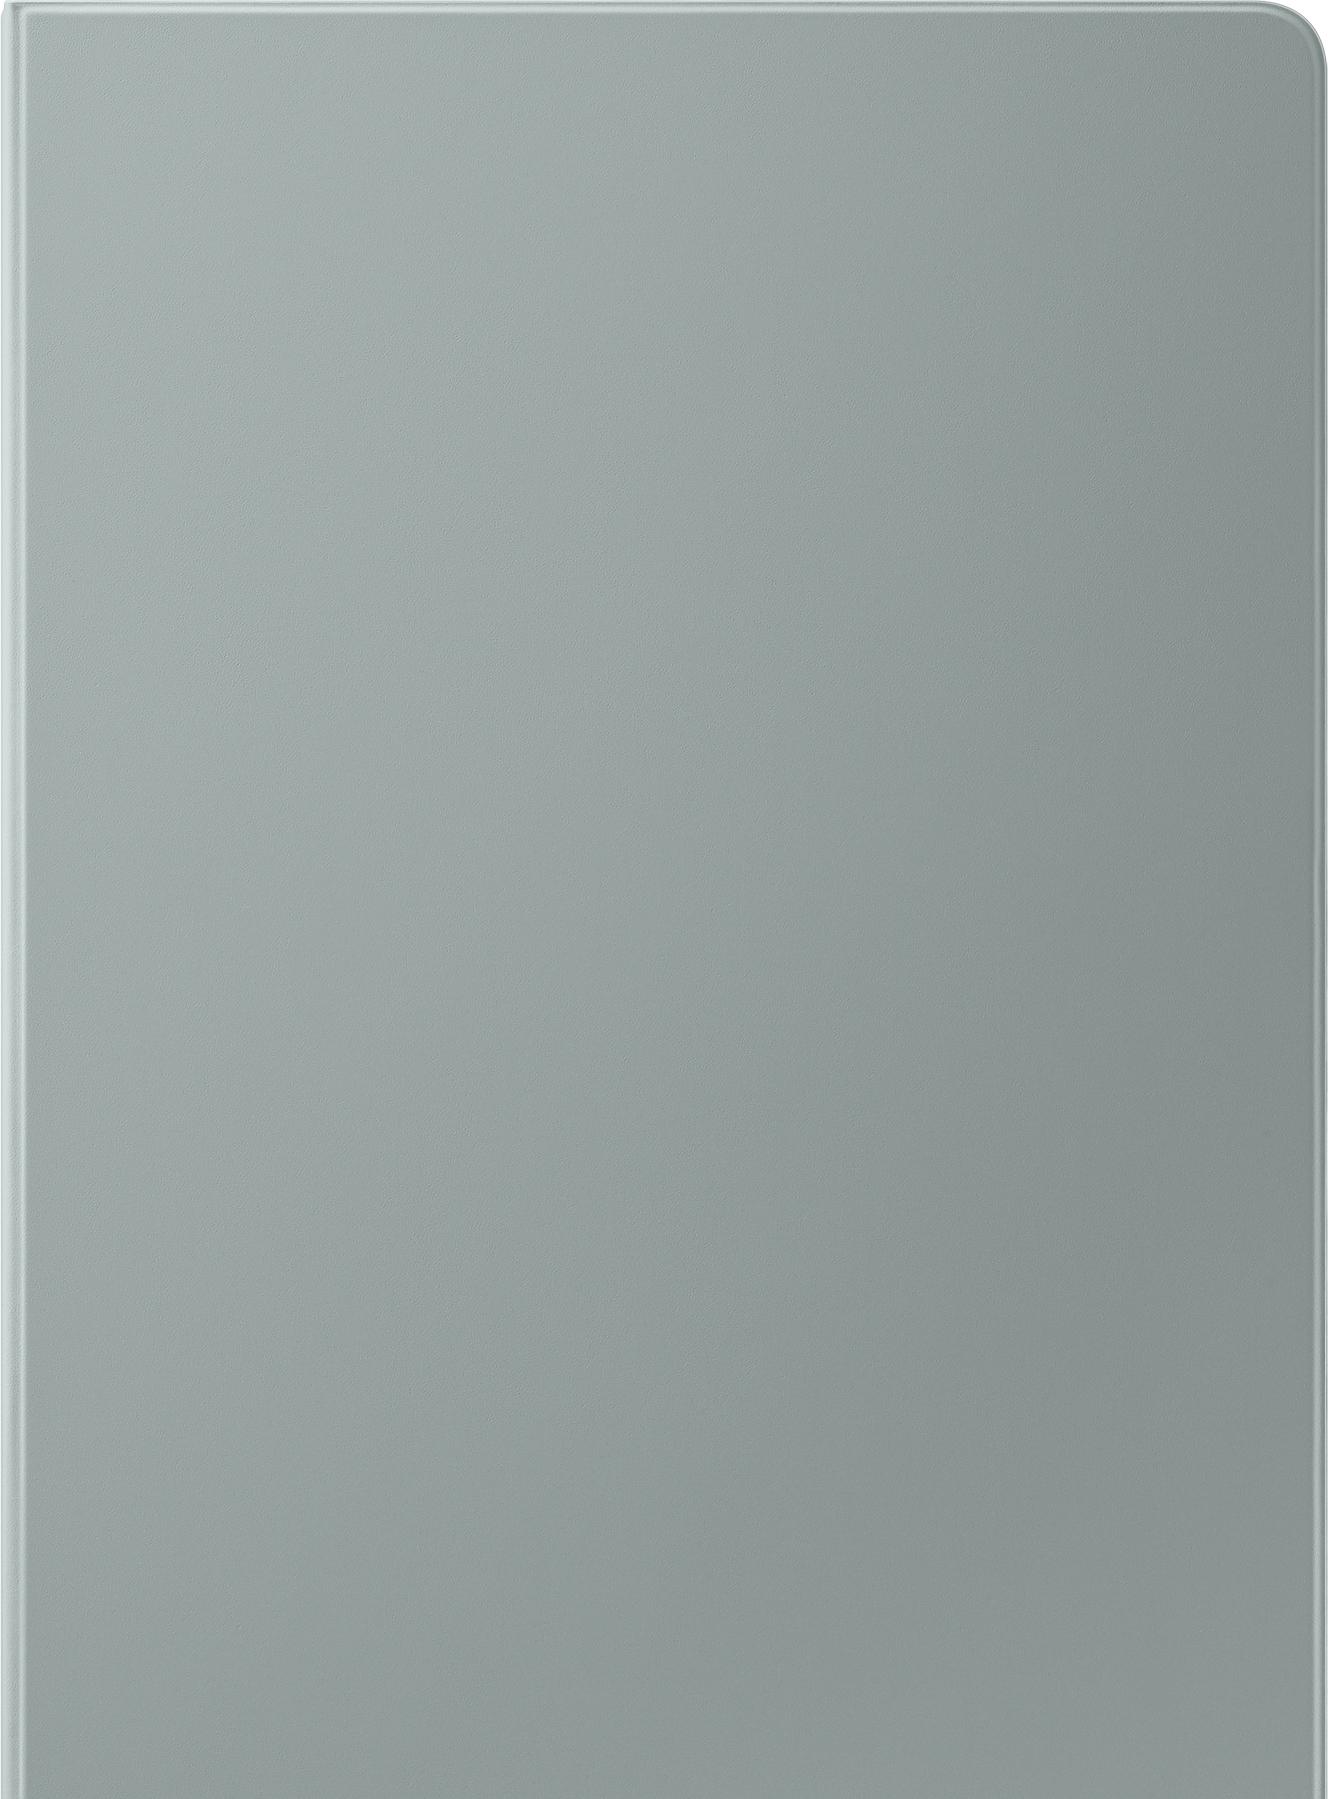 Чехол для планшета Samsung Book Cover для Samsung Galaxy Tab S7+/S7 FE (светло-зеленый)